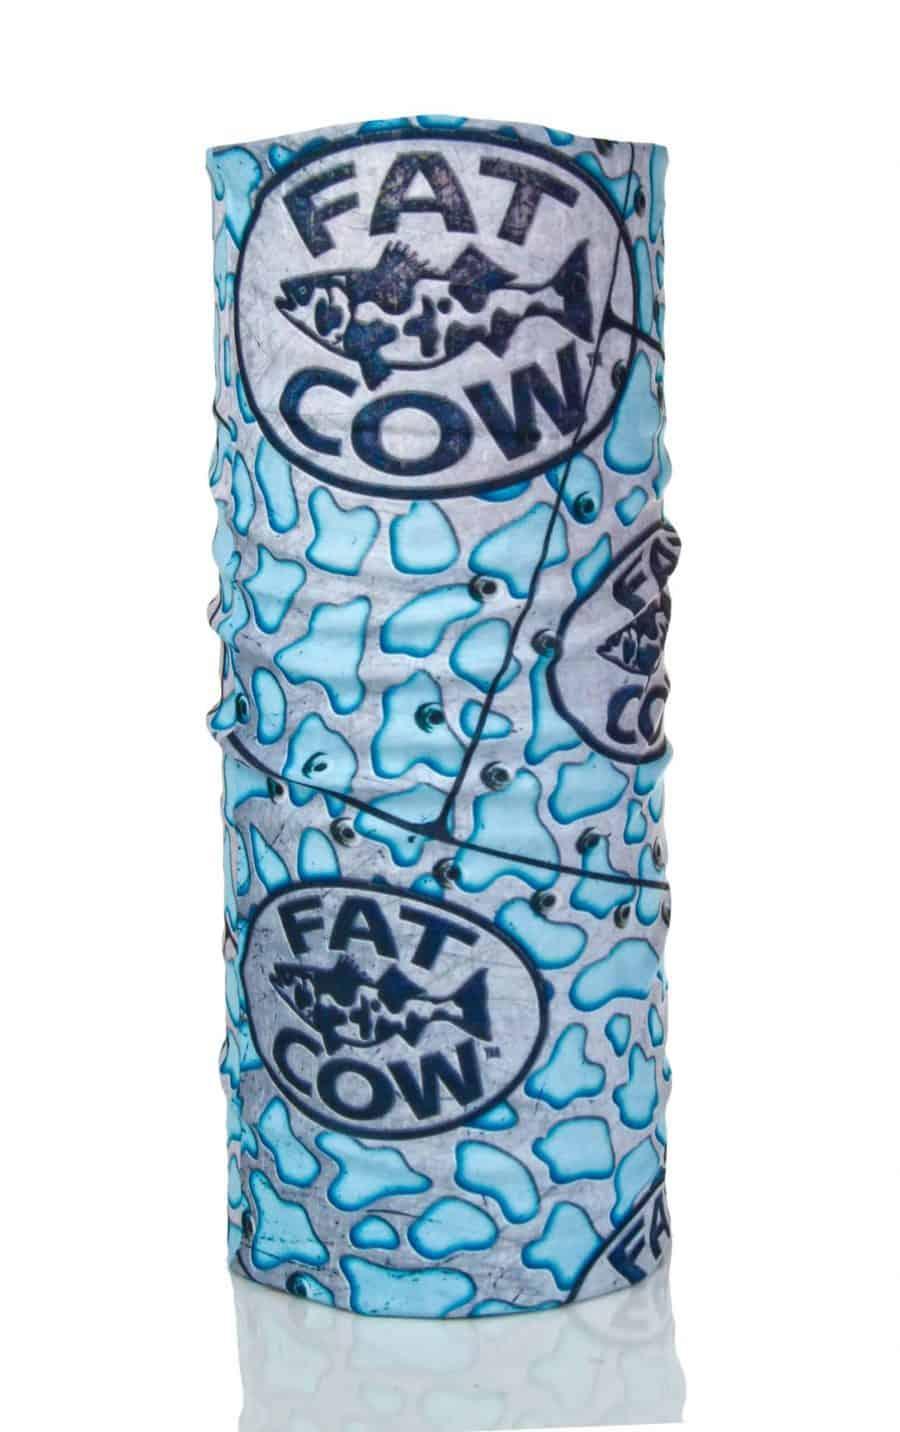 Fat Cow Fishing Face Mask Shield blue